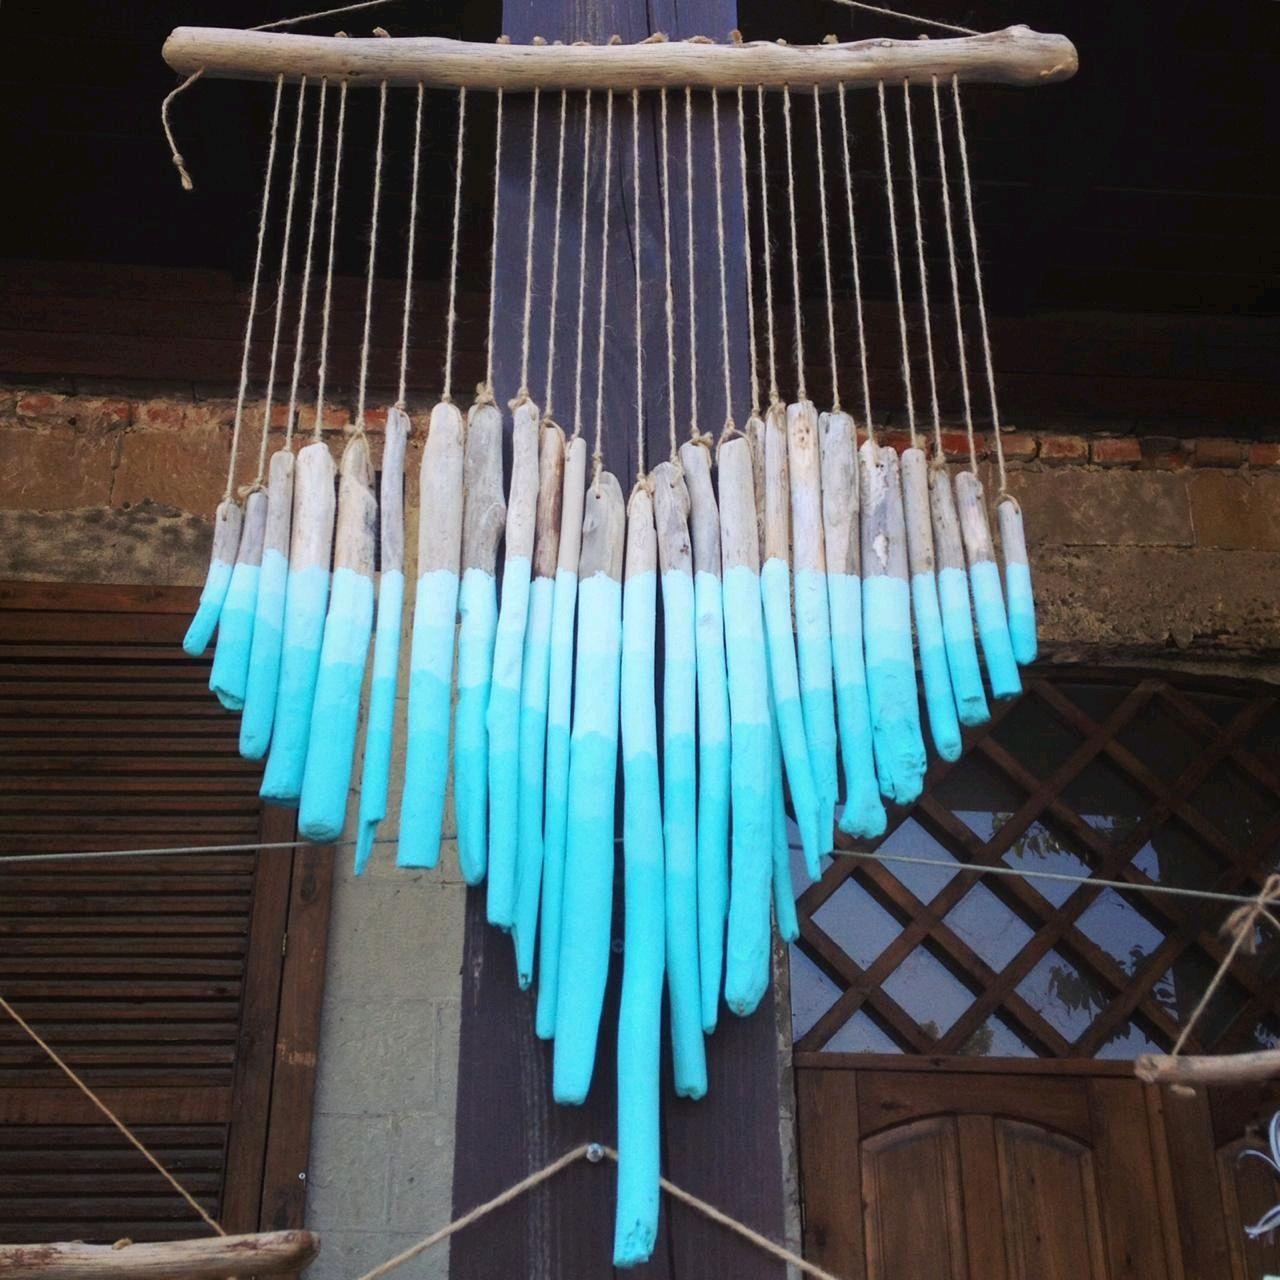 manualidades. Livemaster - hecho a mano. Comprar Driftvud podvesnoe Corazón Marino. HandmadeHeart, loft, suspension, wooden wedding, salt